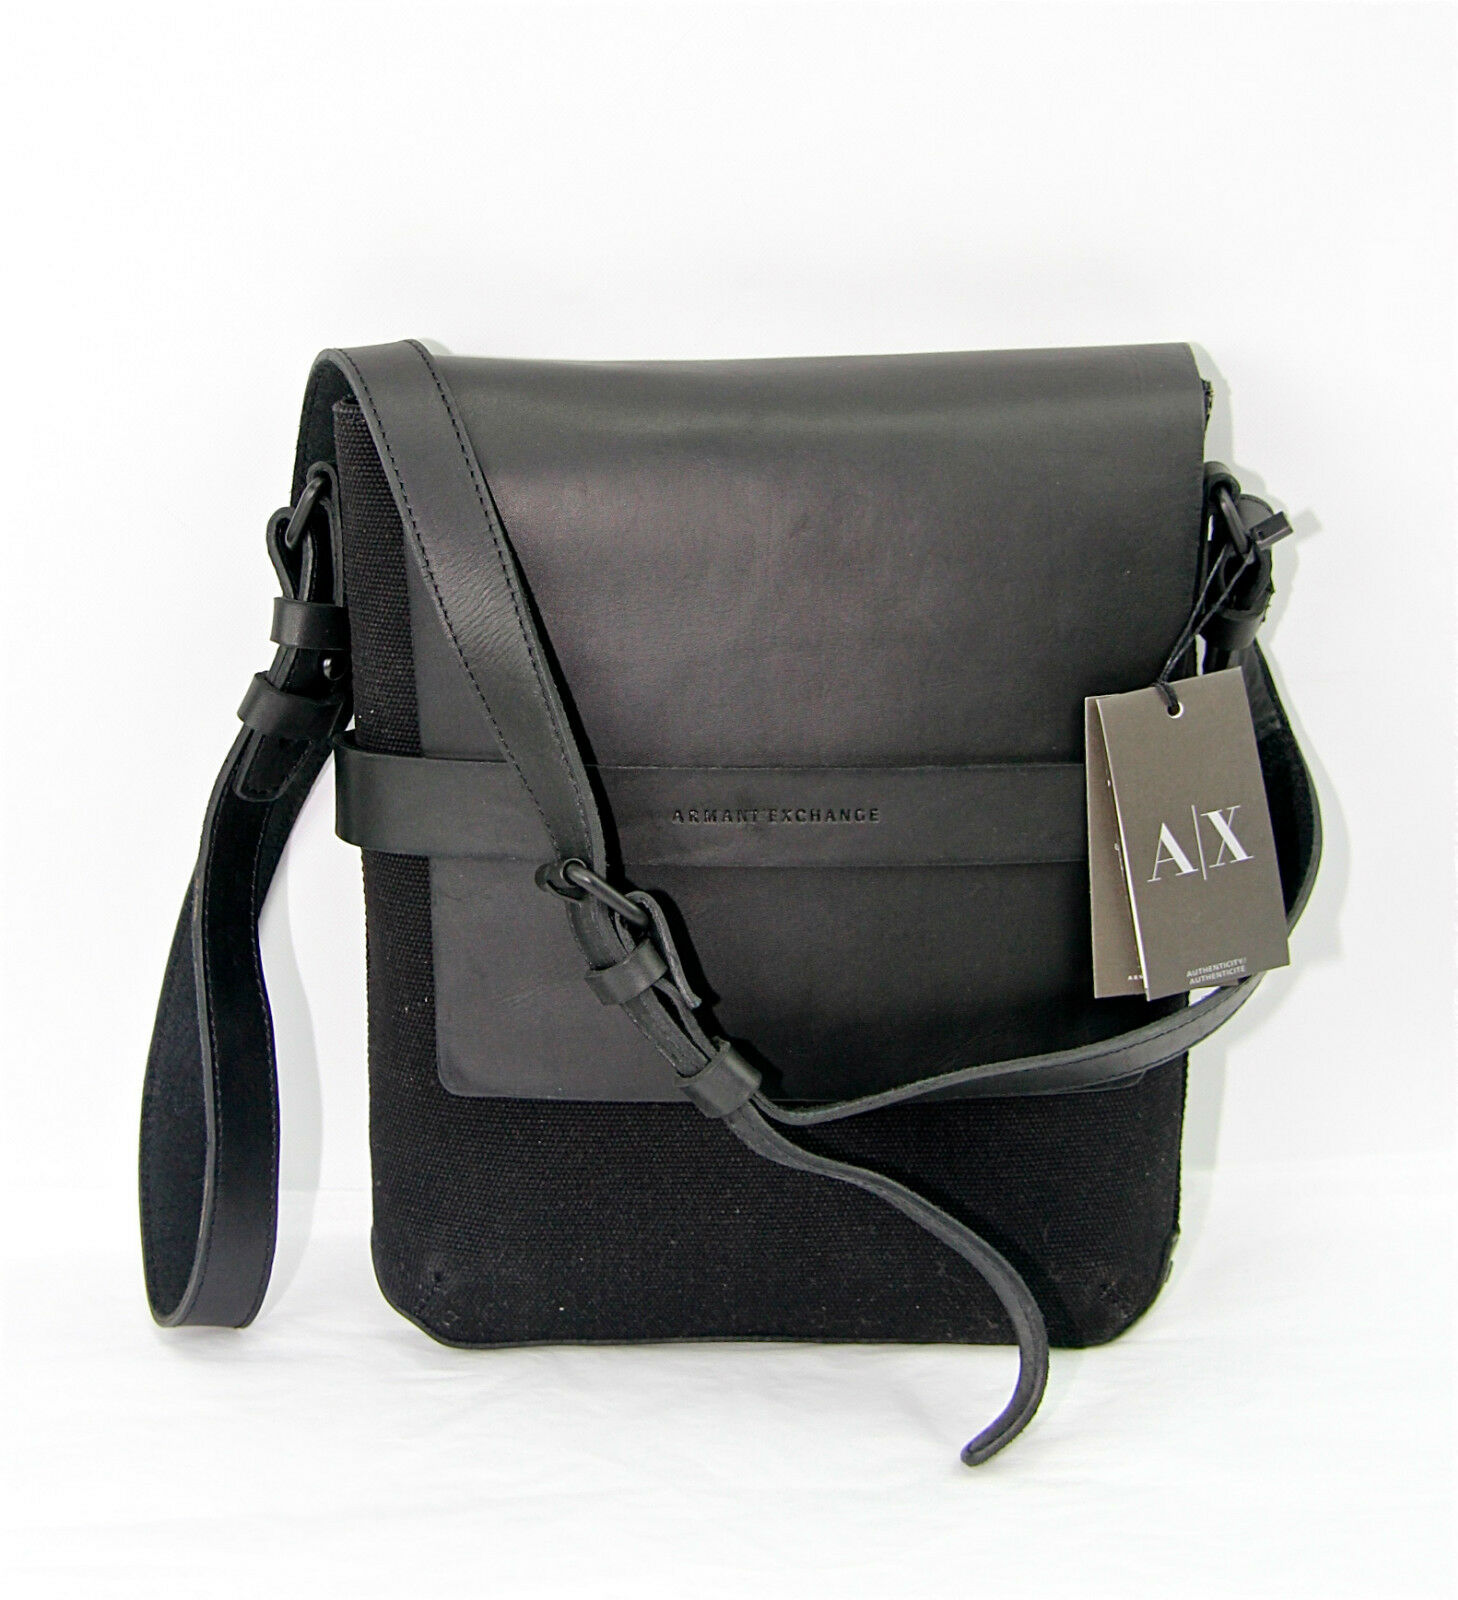 aa8ba3c2979 A X ARMANI EXCHANGE Messenger Crossbody Side Bag Pouch Satchel 100% New фото